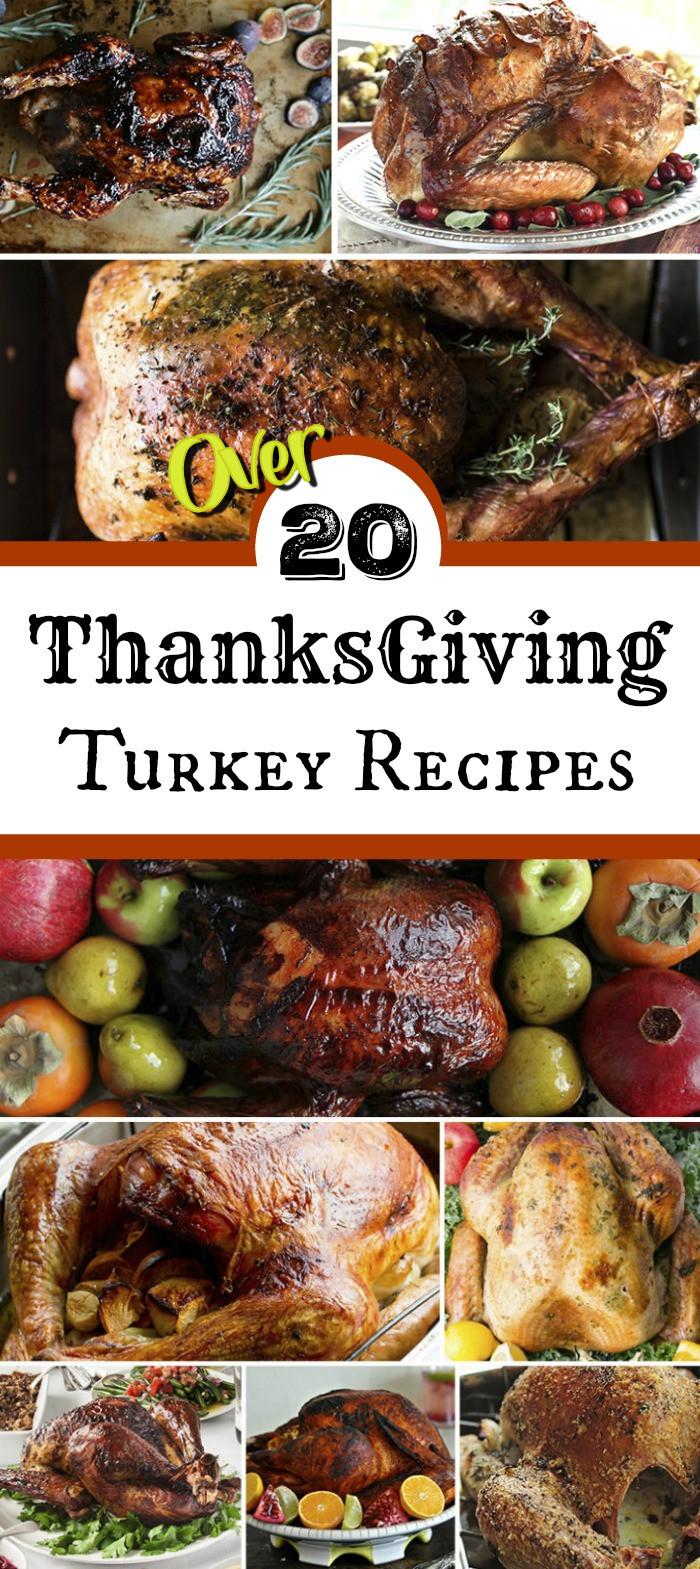 Best Turkey Recipes For Thanksgiving  Thanksgiving Turkey Recipes for the Best Thanksgiving